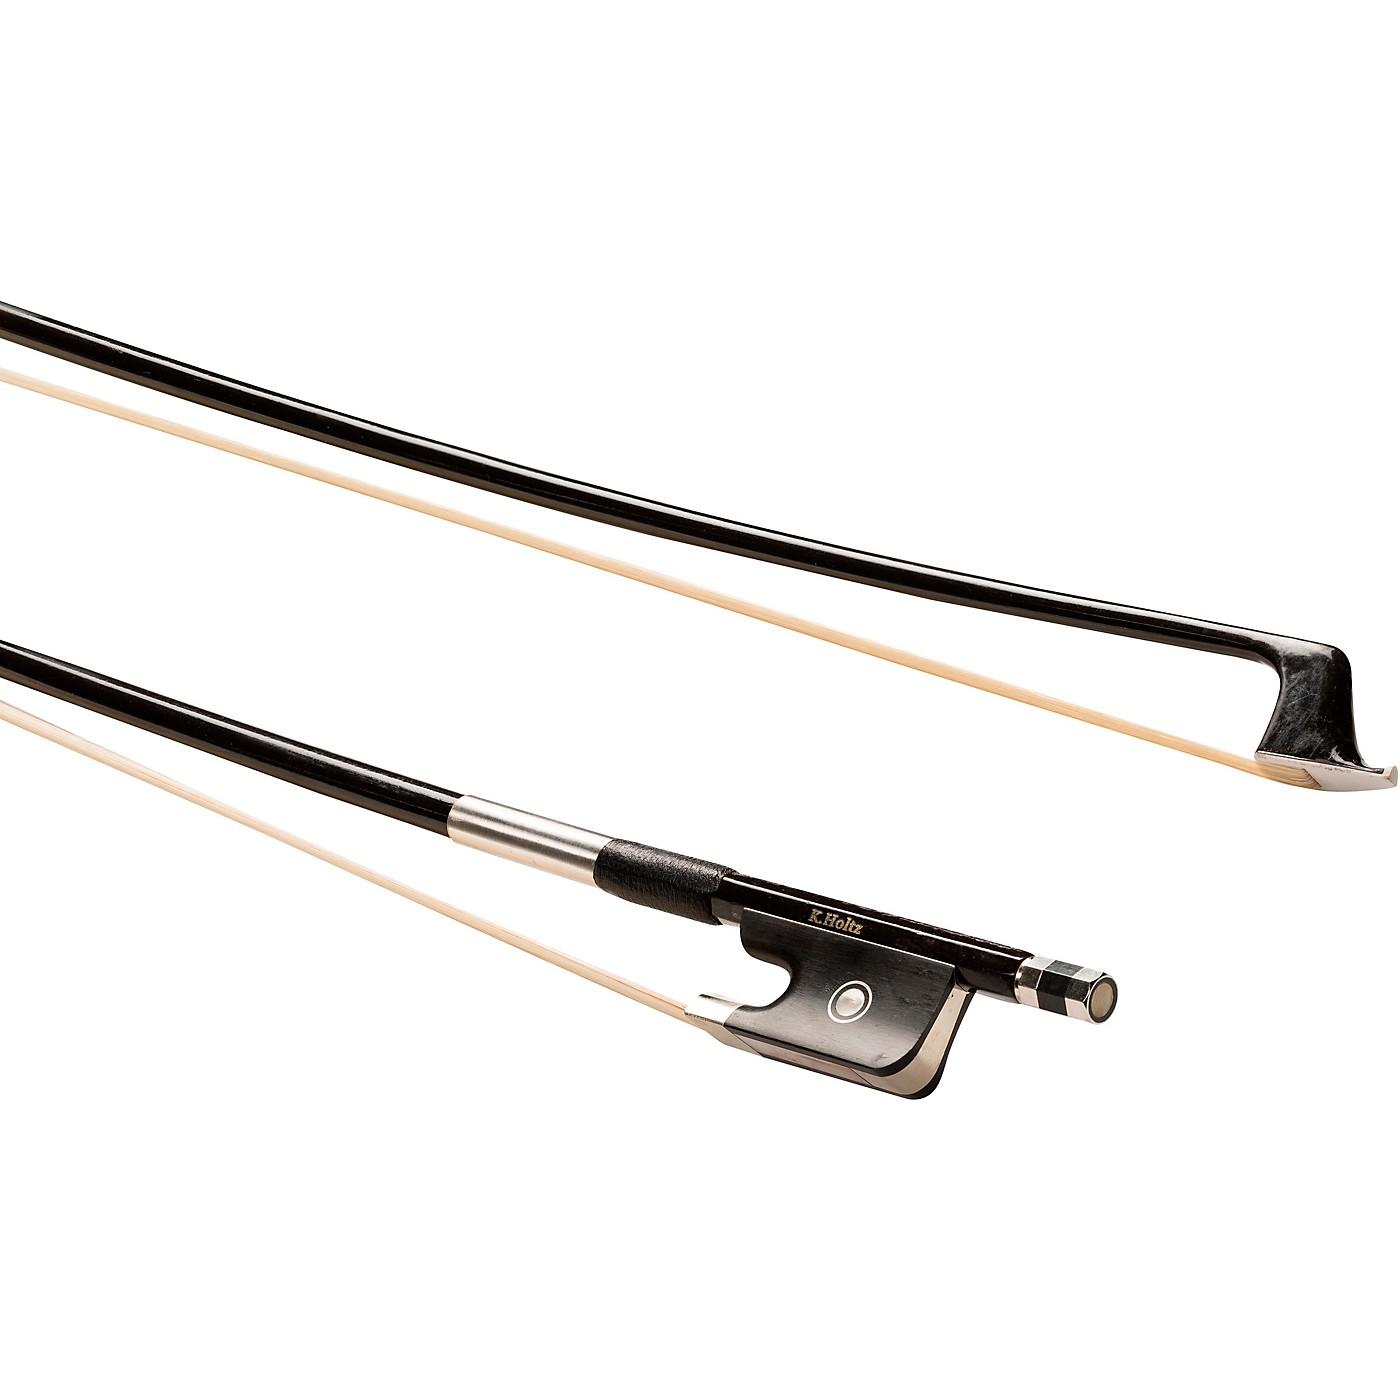 K Holtz BC10 FG Series Fiberglass Cello Bow thumbnail